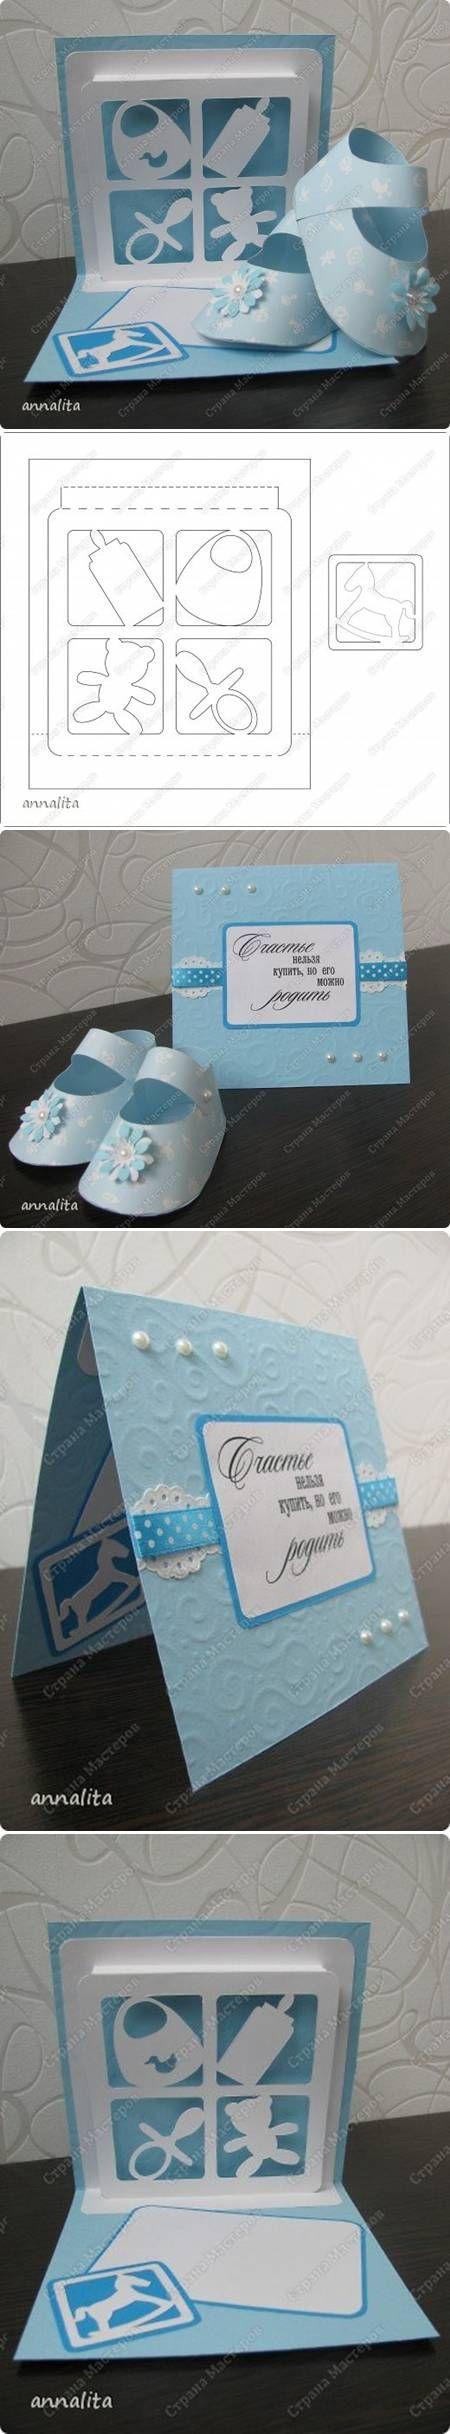 DIY Newborn Card Template | Buzz + Inspired